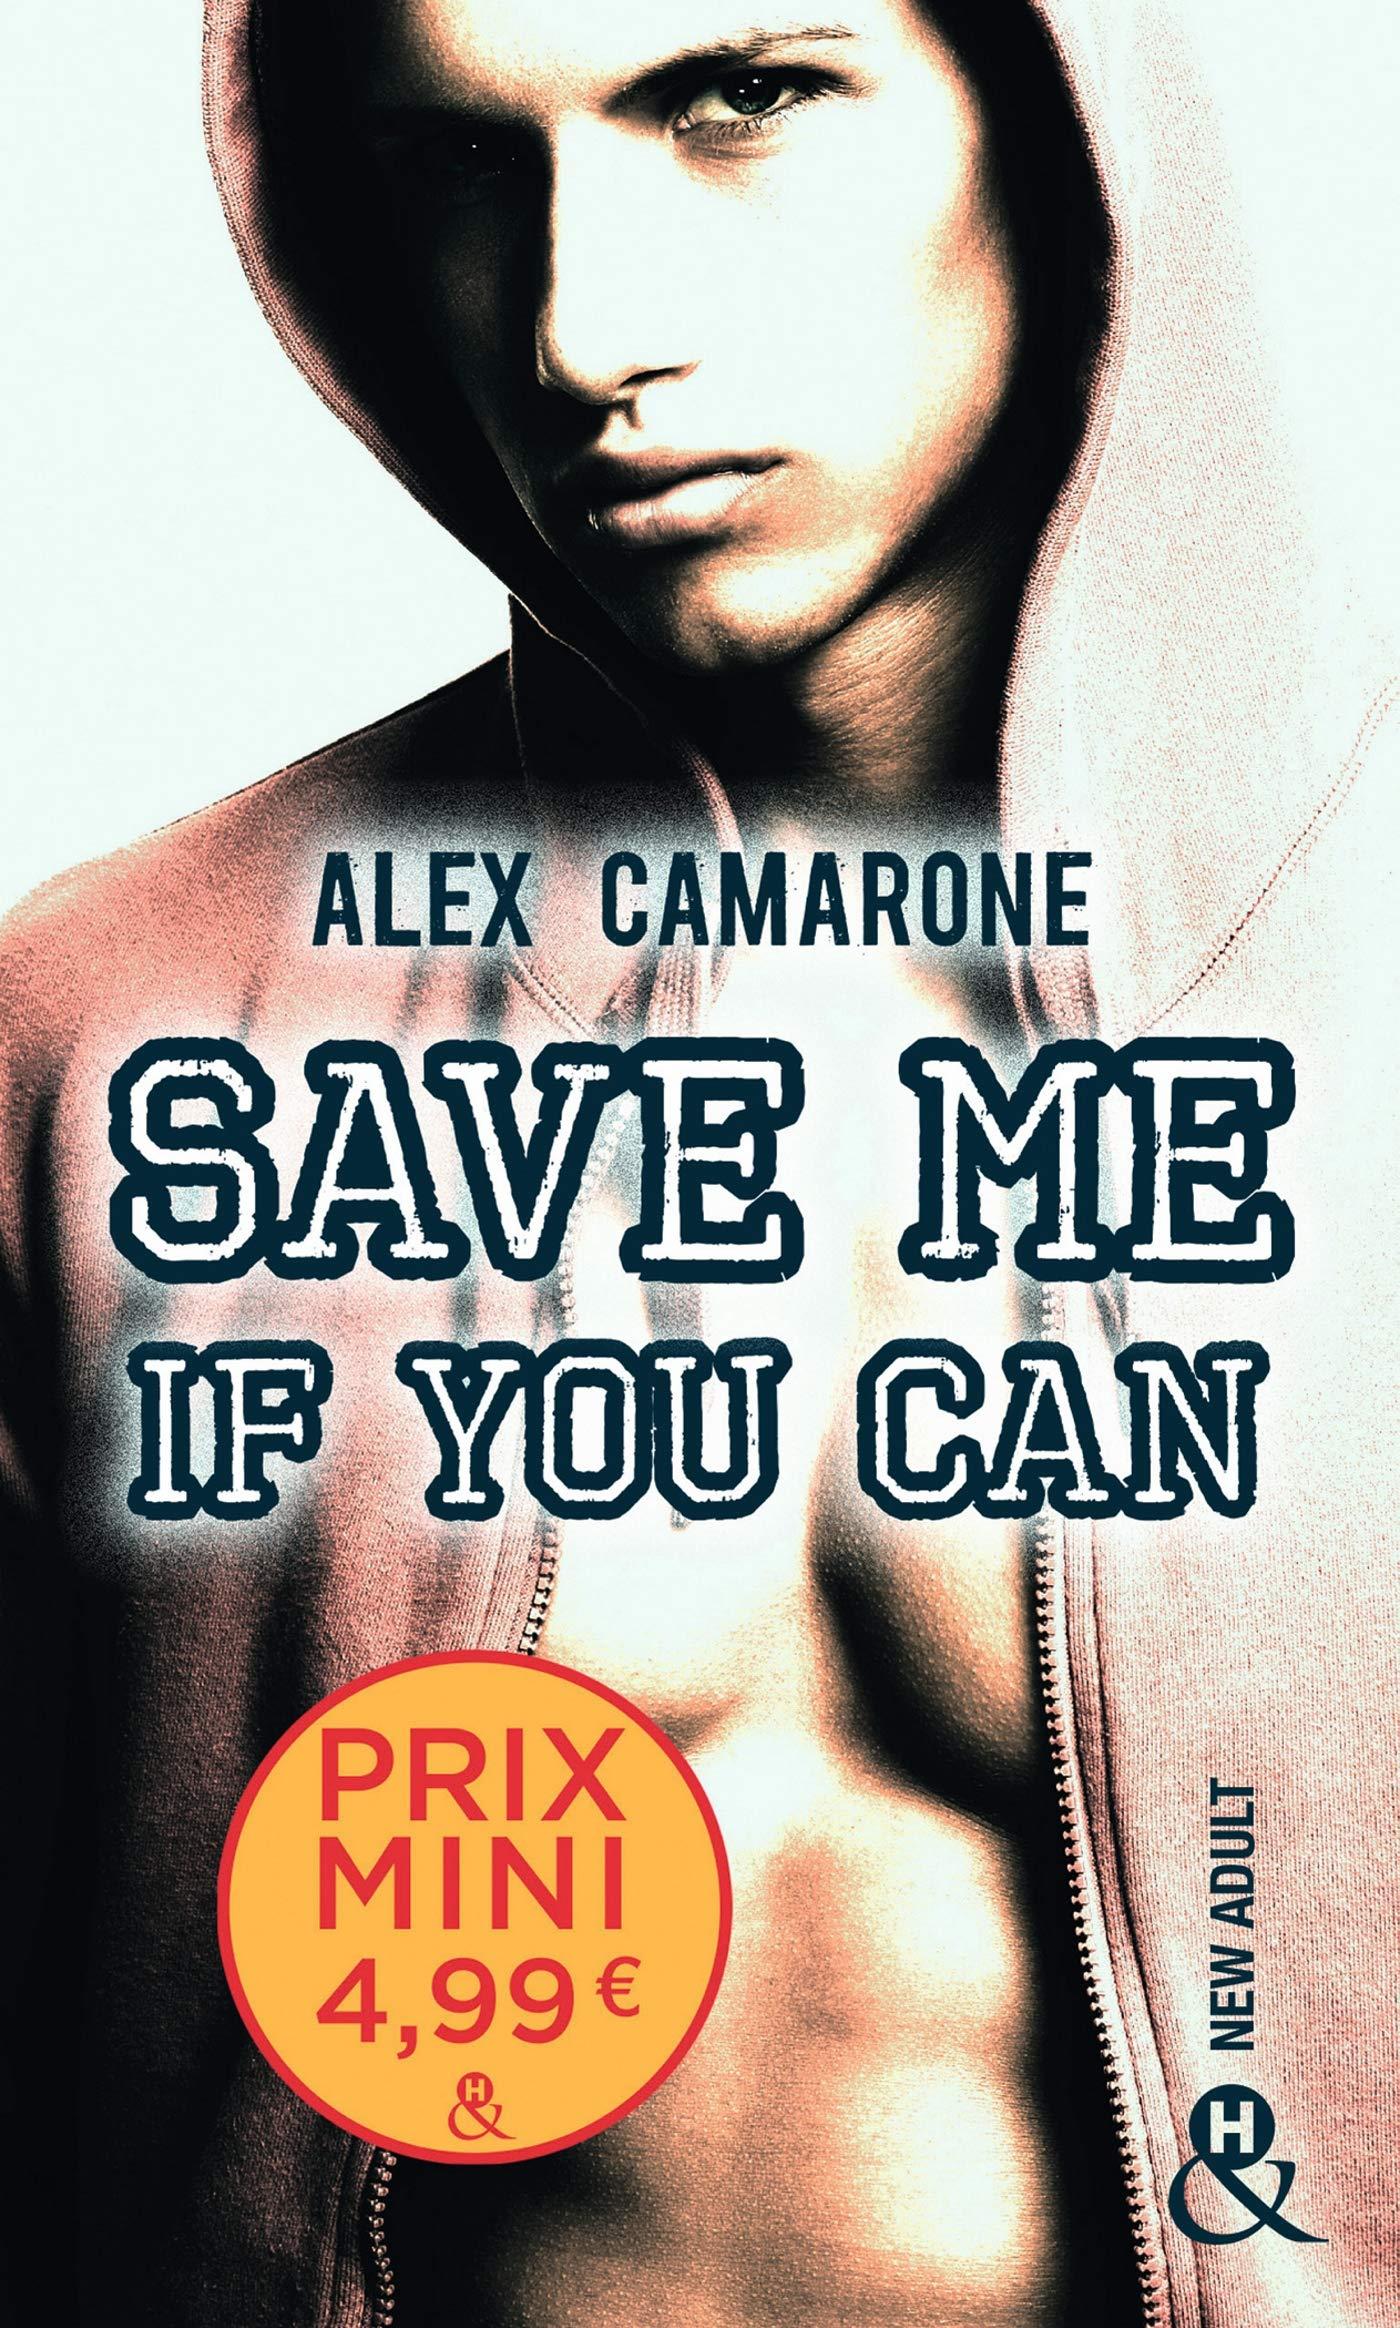 Save me if you can de Alex Camarone 81yvzf11